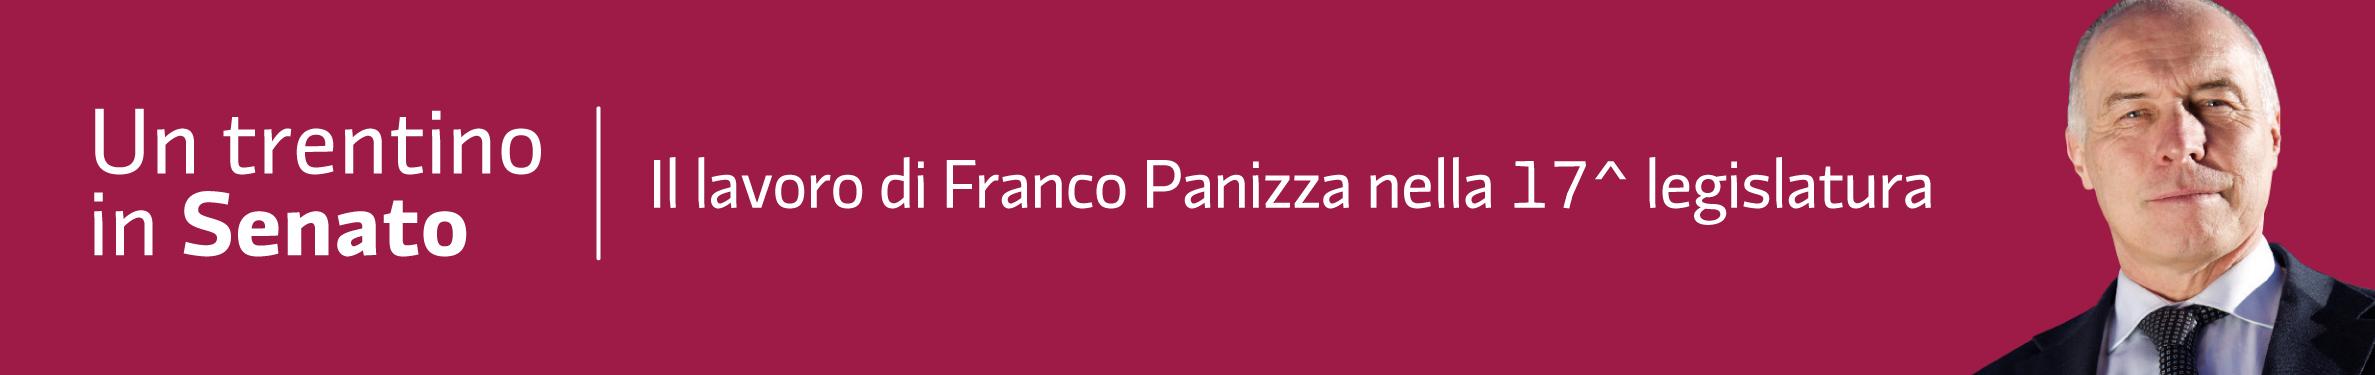 Resoconto Franco Panizza